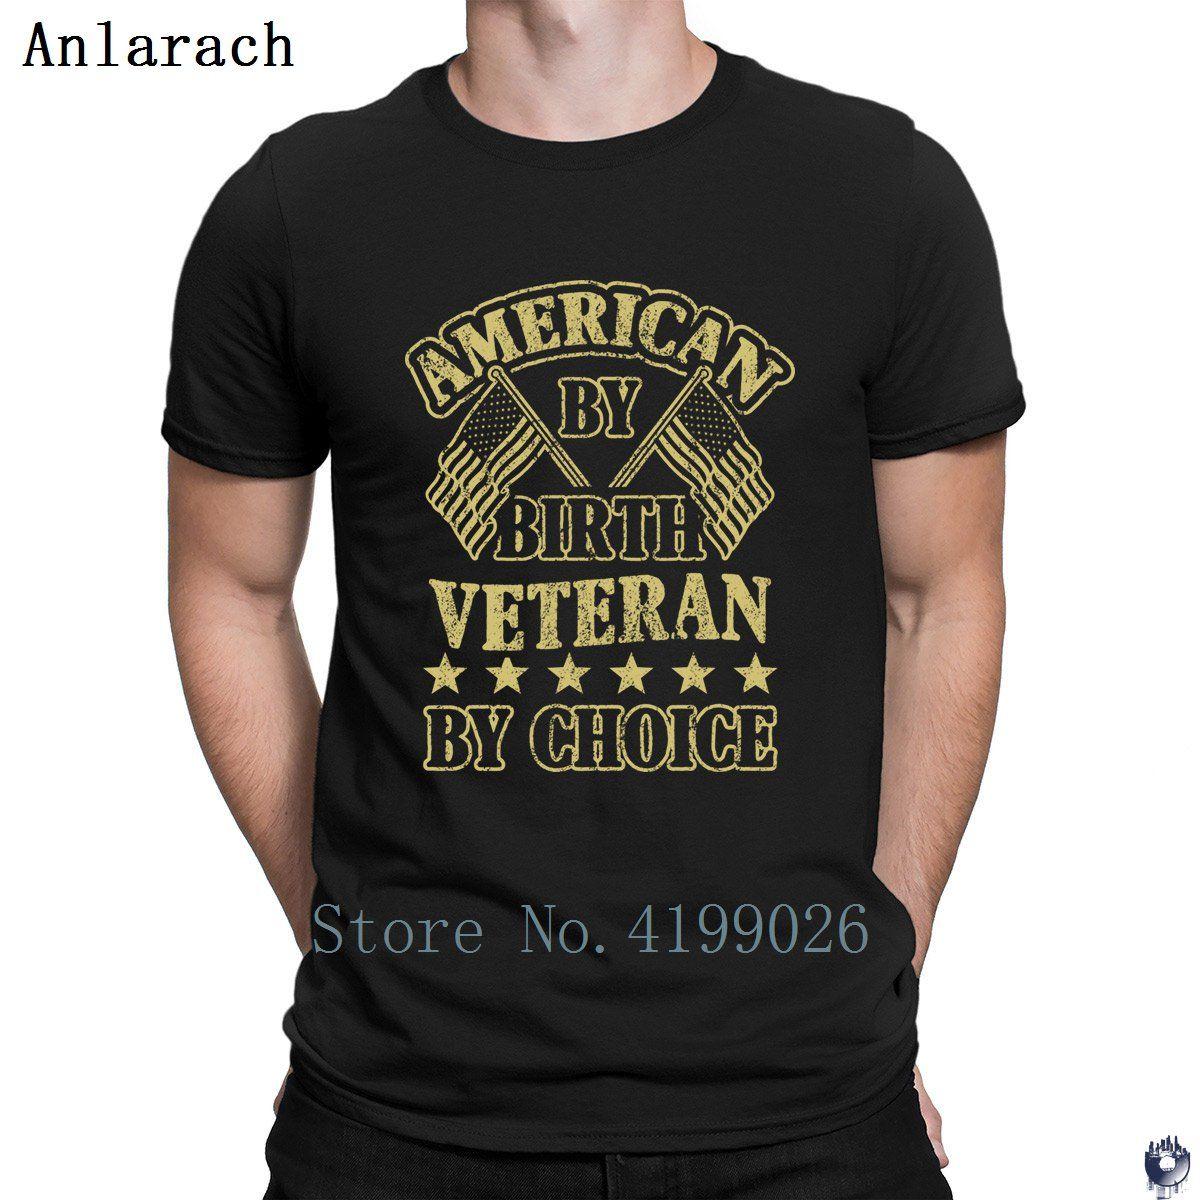 8b64d087c68 American Veteran T Shirts New Arrival Clothing HipHop Summer Men S Tshirt  Printed Novelty Branded Cotton Simple Retro T Shirts Tshirt Designs From  Dzchiwu